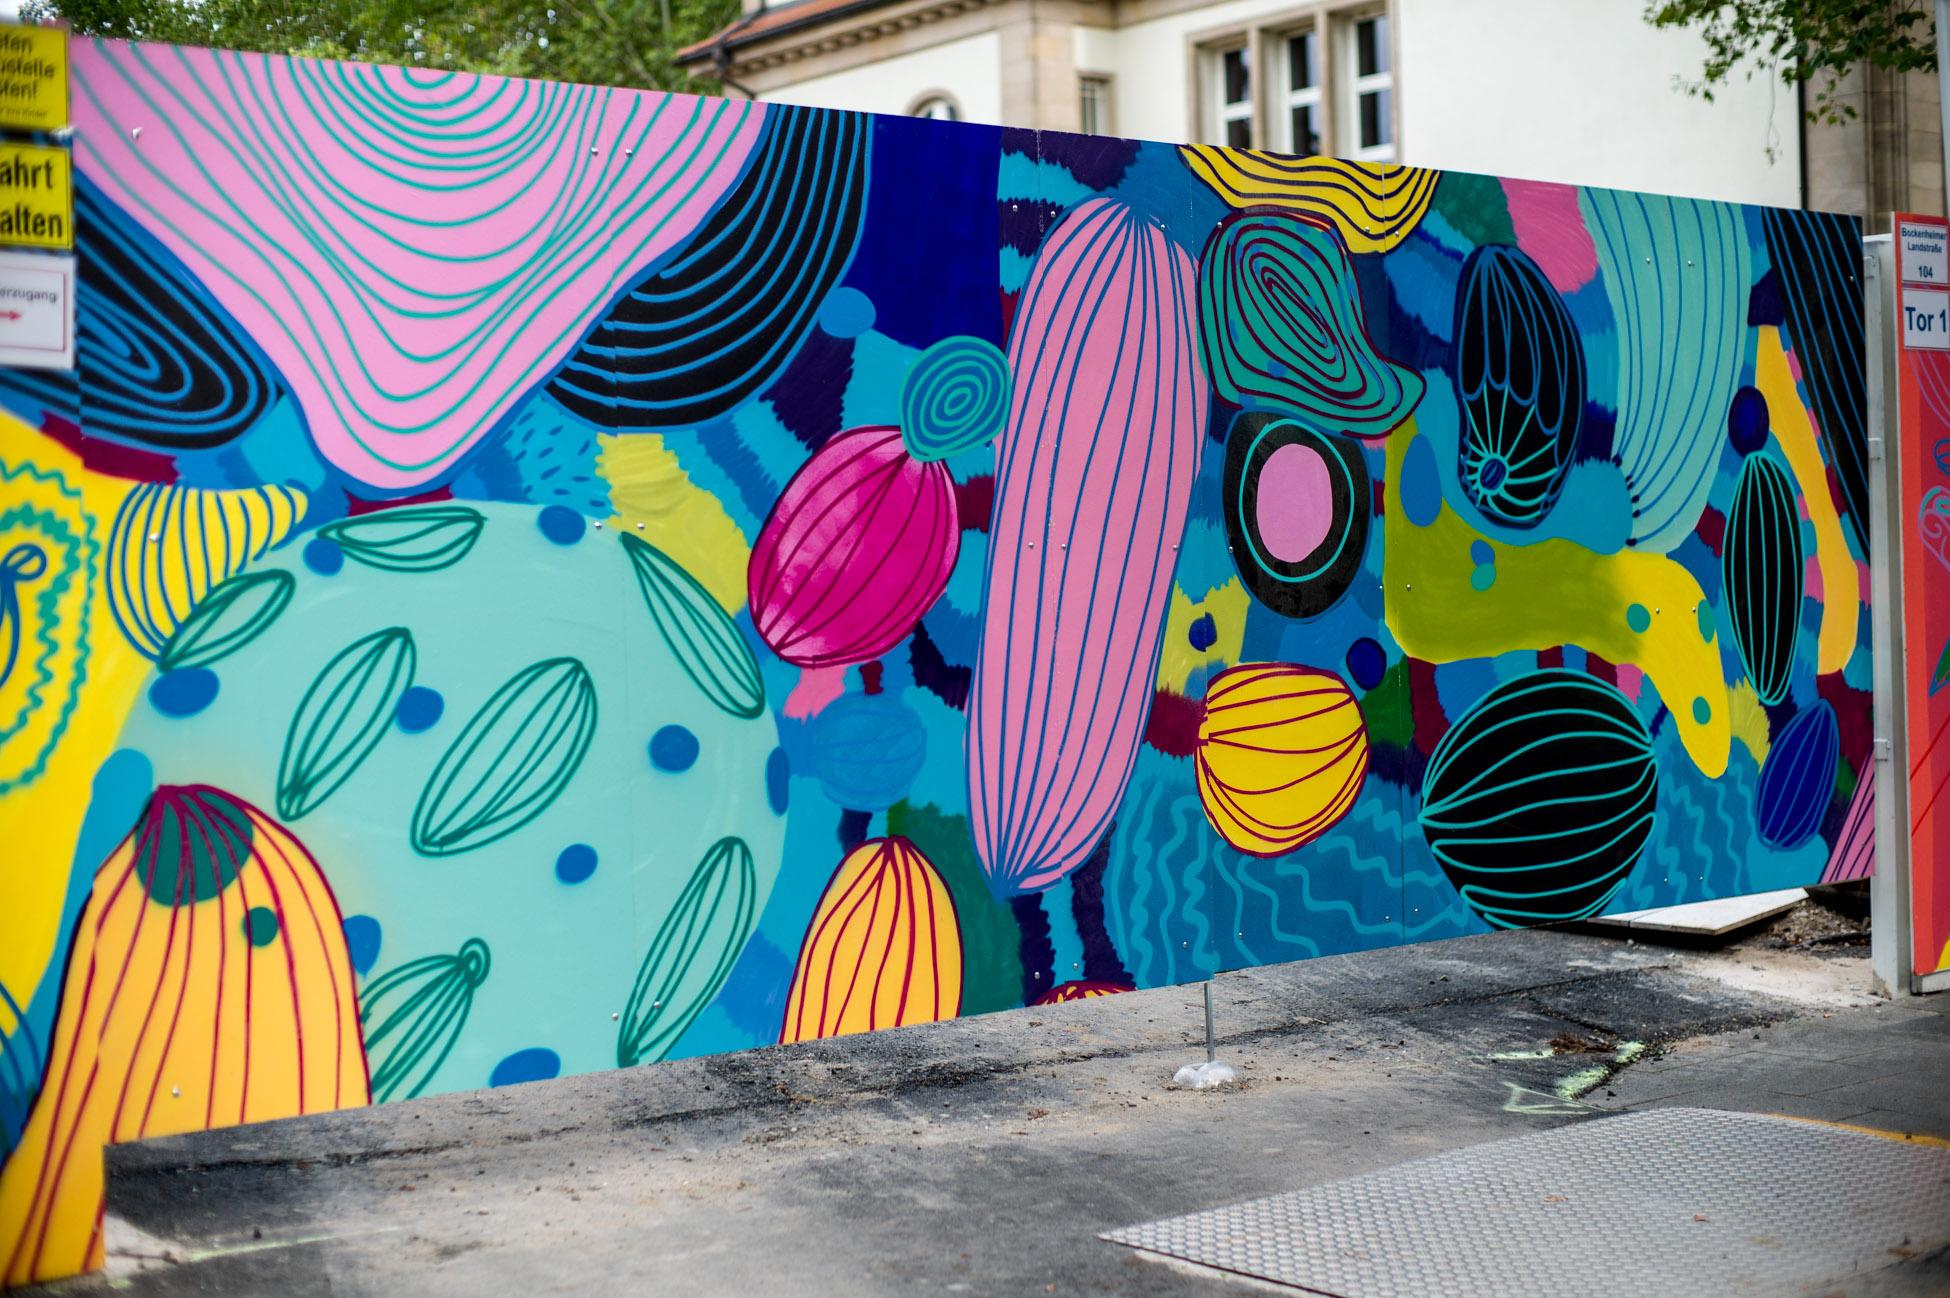 Streetart_Brazil_Rimon guimaraes_2013_Frankfurt (8 von 15)